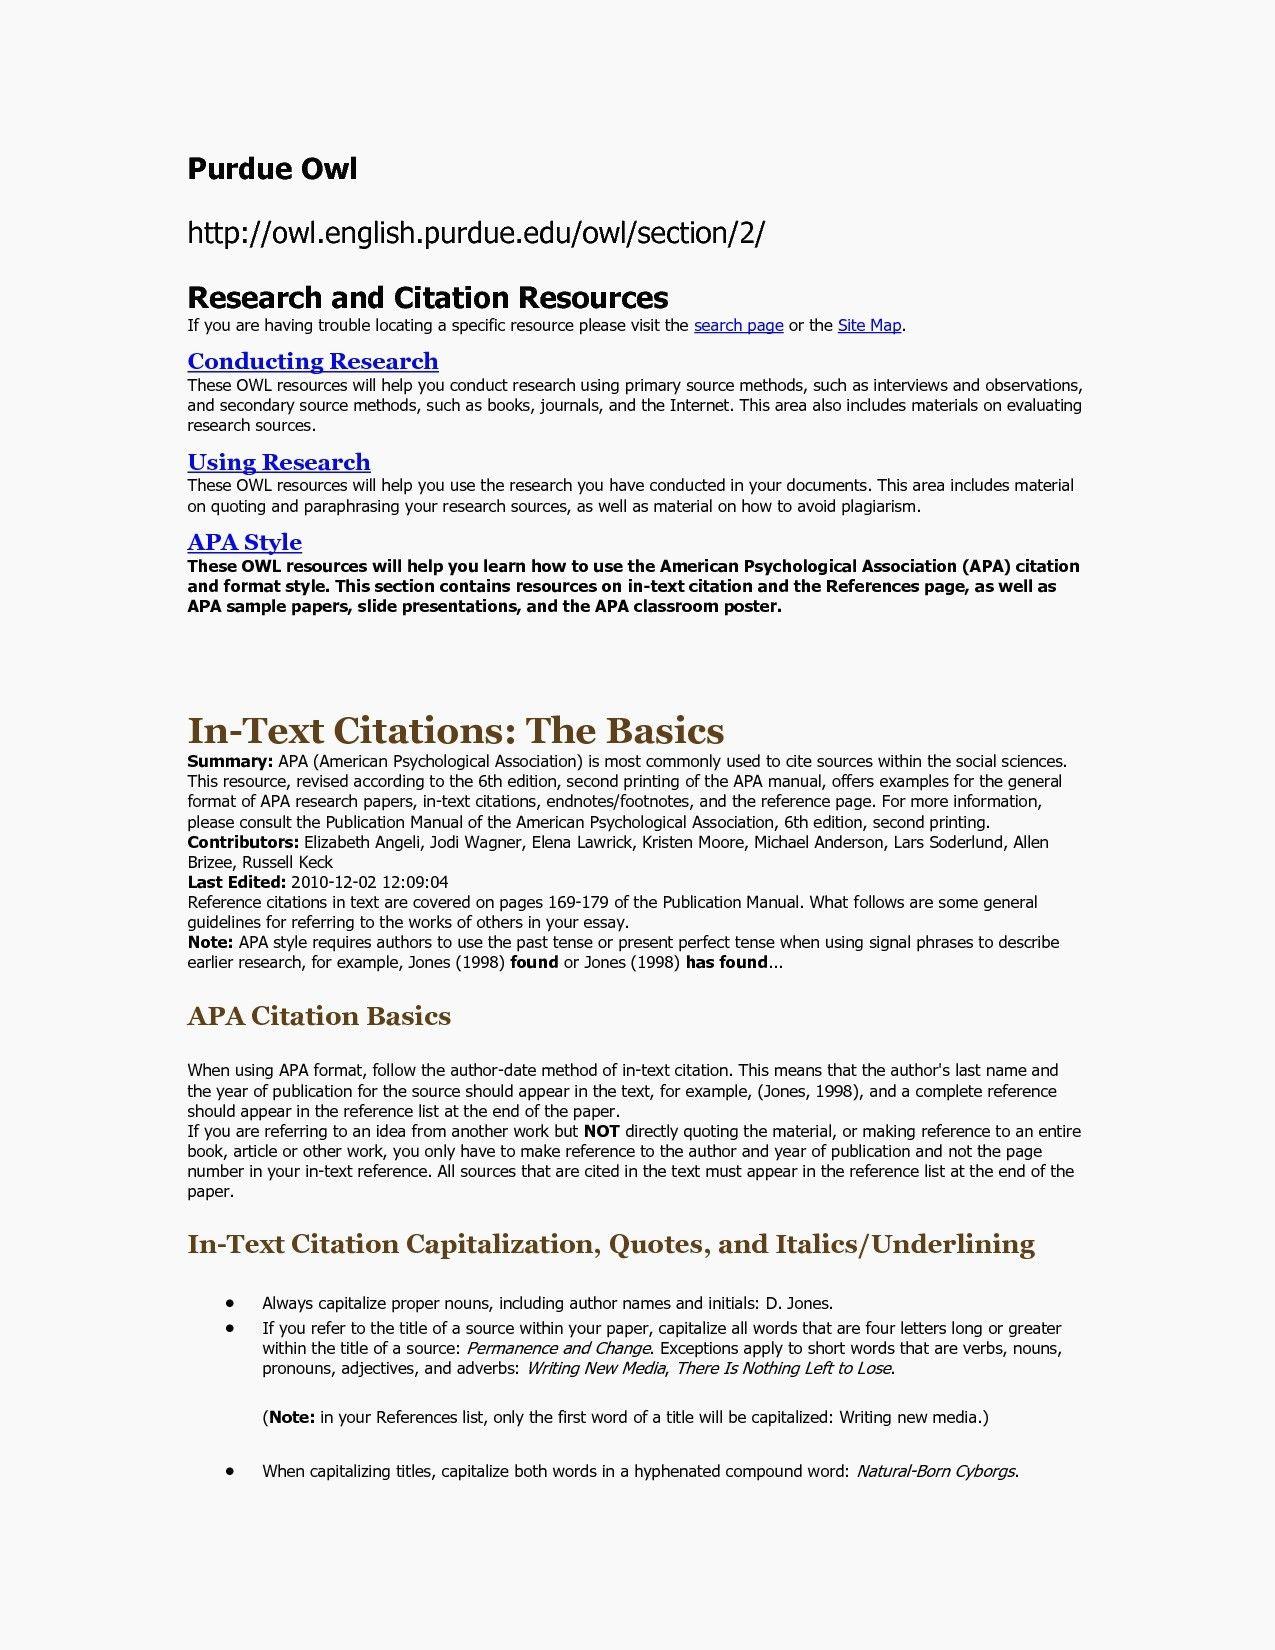 Resume Format Purdue Owl Verb Worksheet Cover Letter Template Apa Book